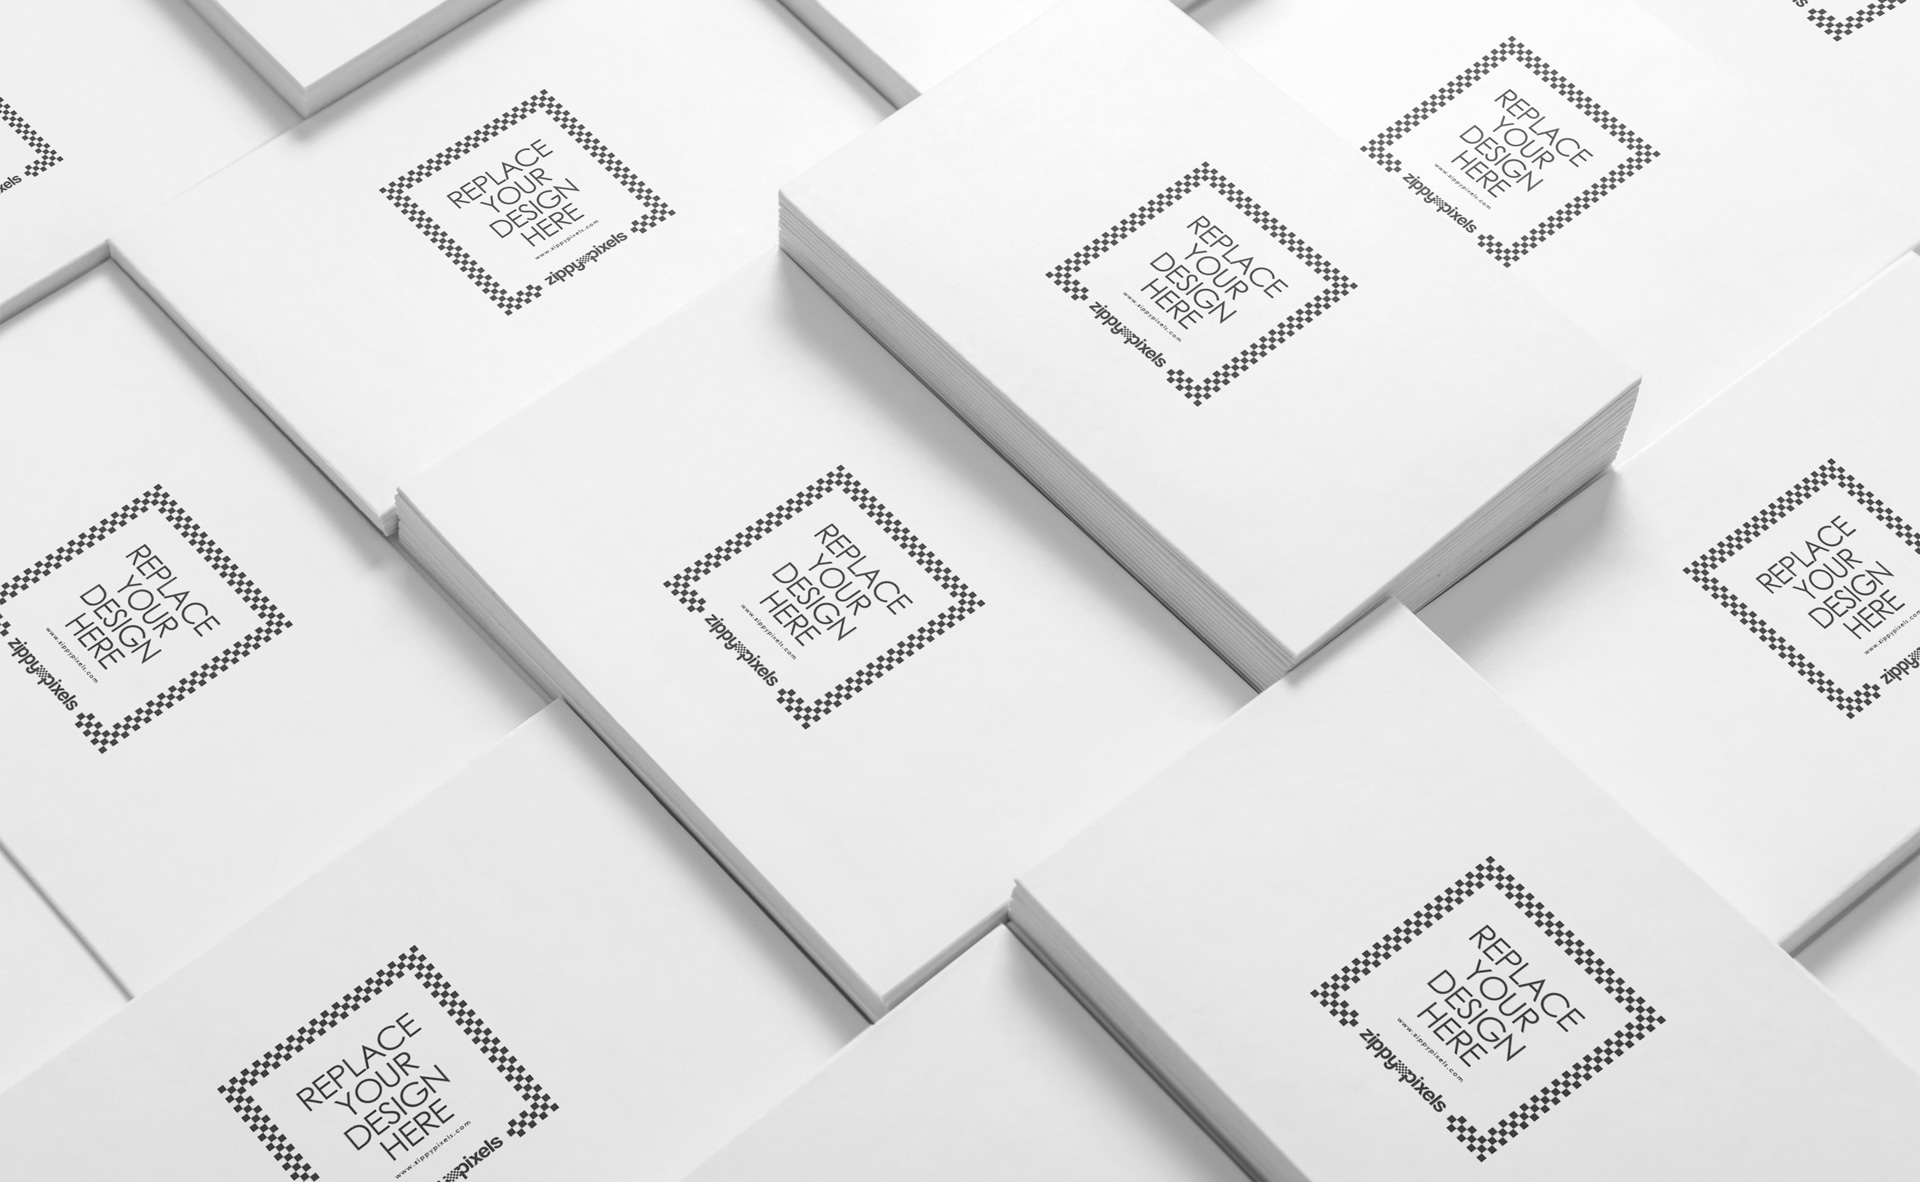 多角度多色彩名片样机展示304-business-card-mockup-free